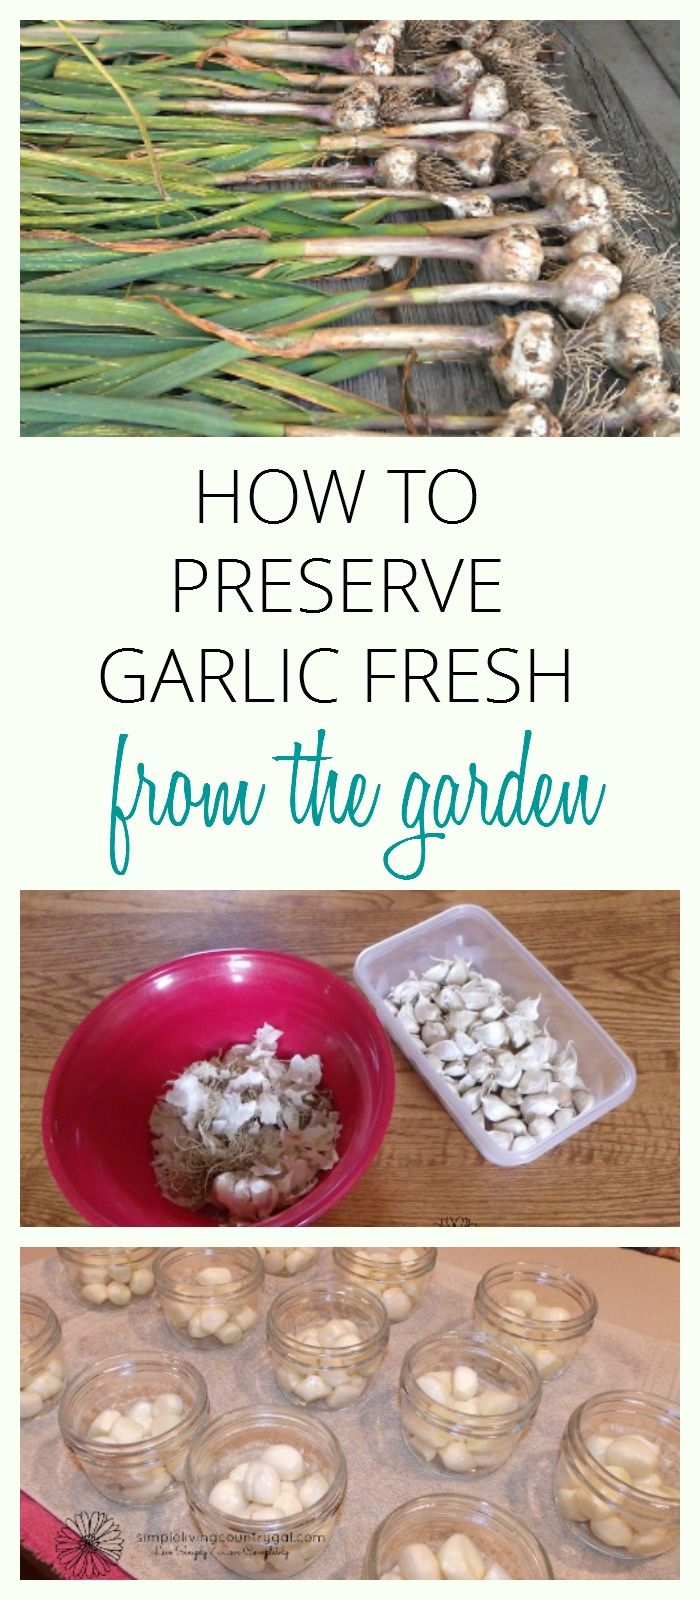 Enjoy fresh garlic year round with this easy step by step guide.  via @SLcountrygal